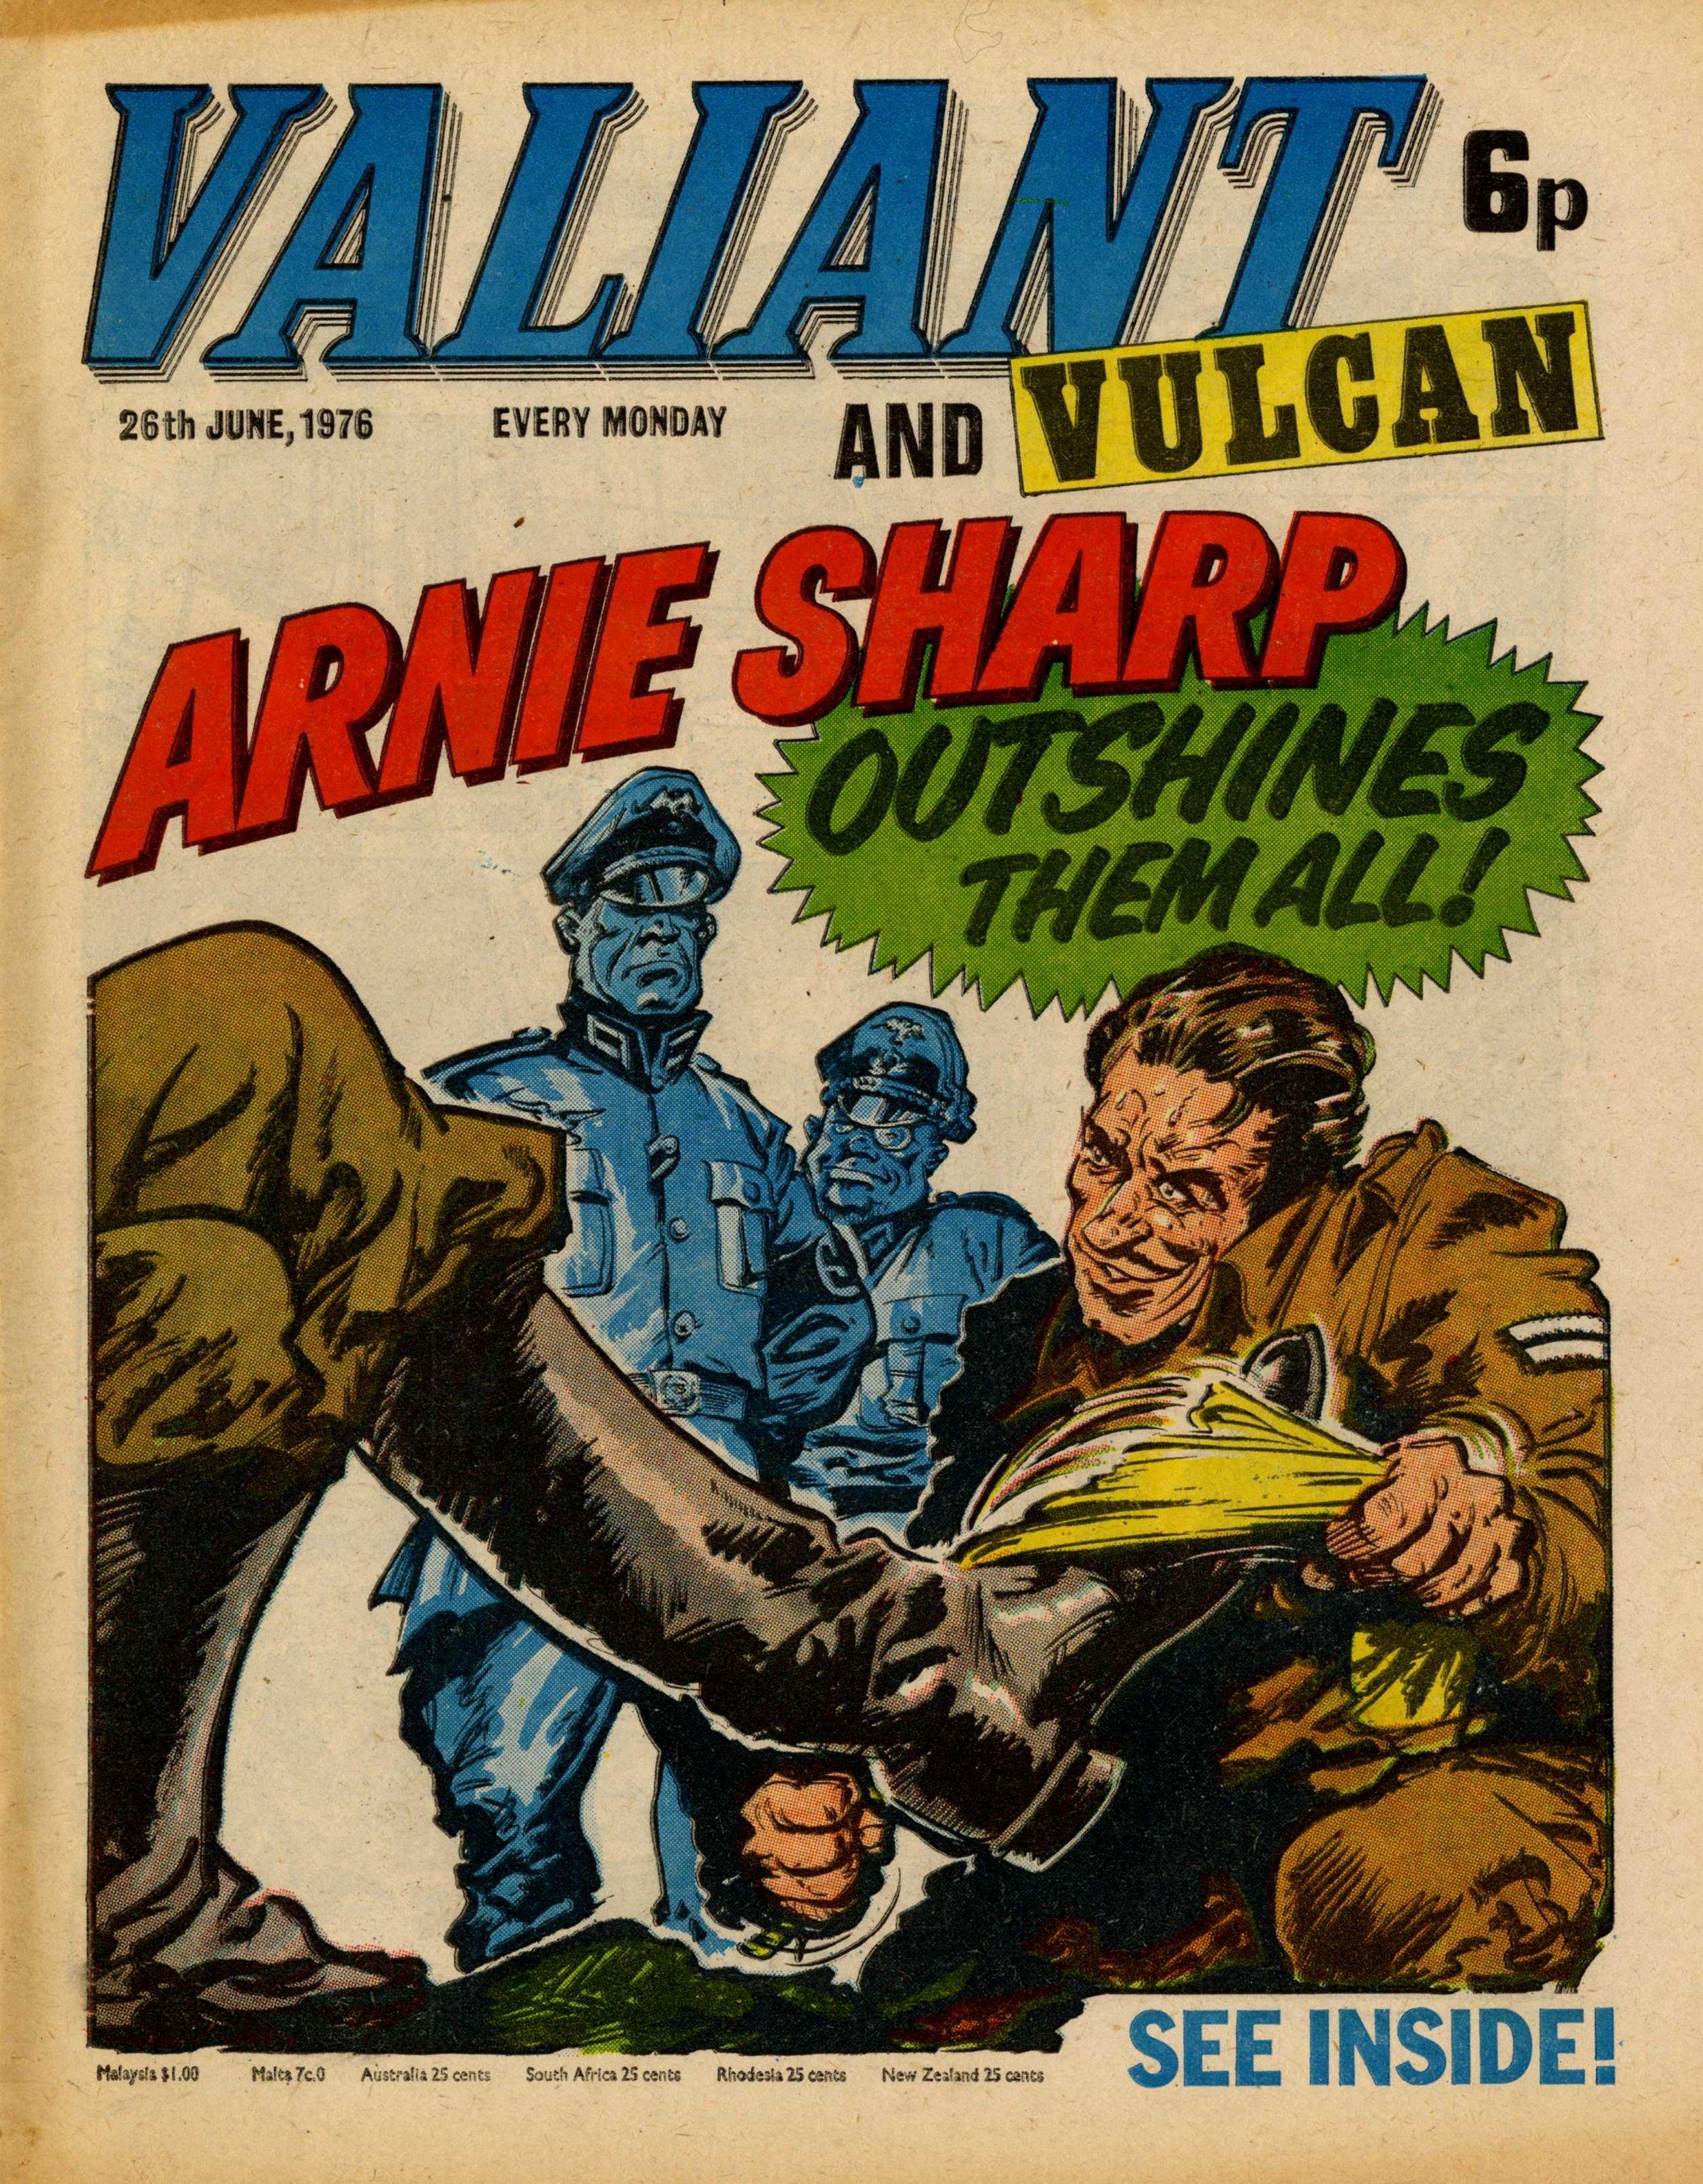 Soldier Sharp, drawn by Jim Watson